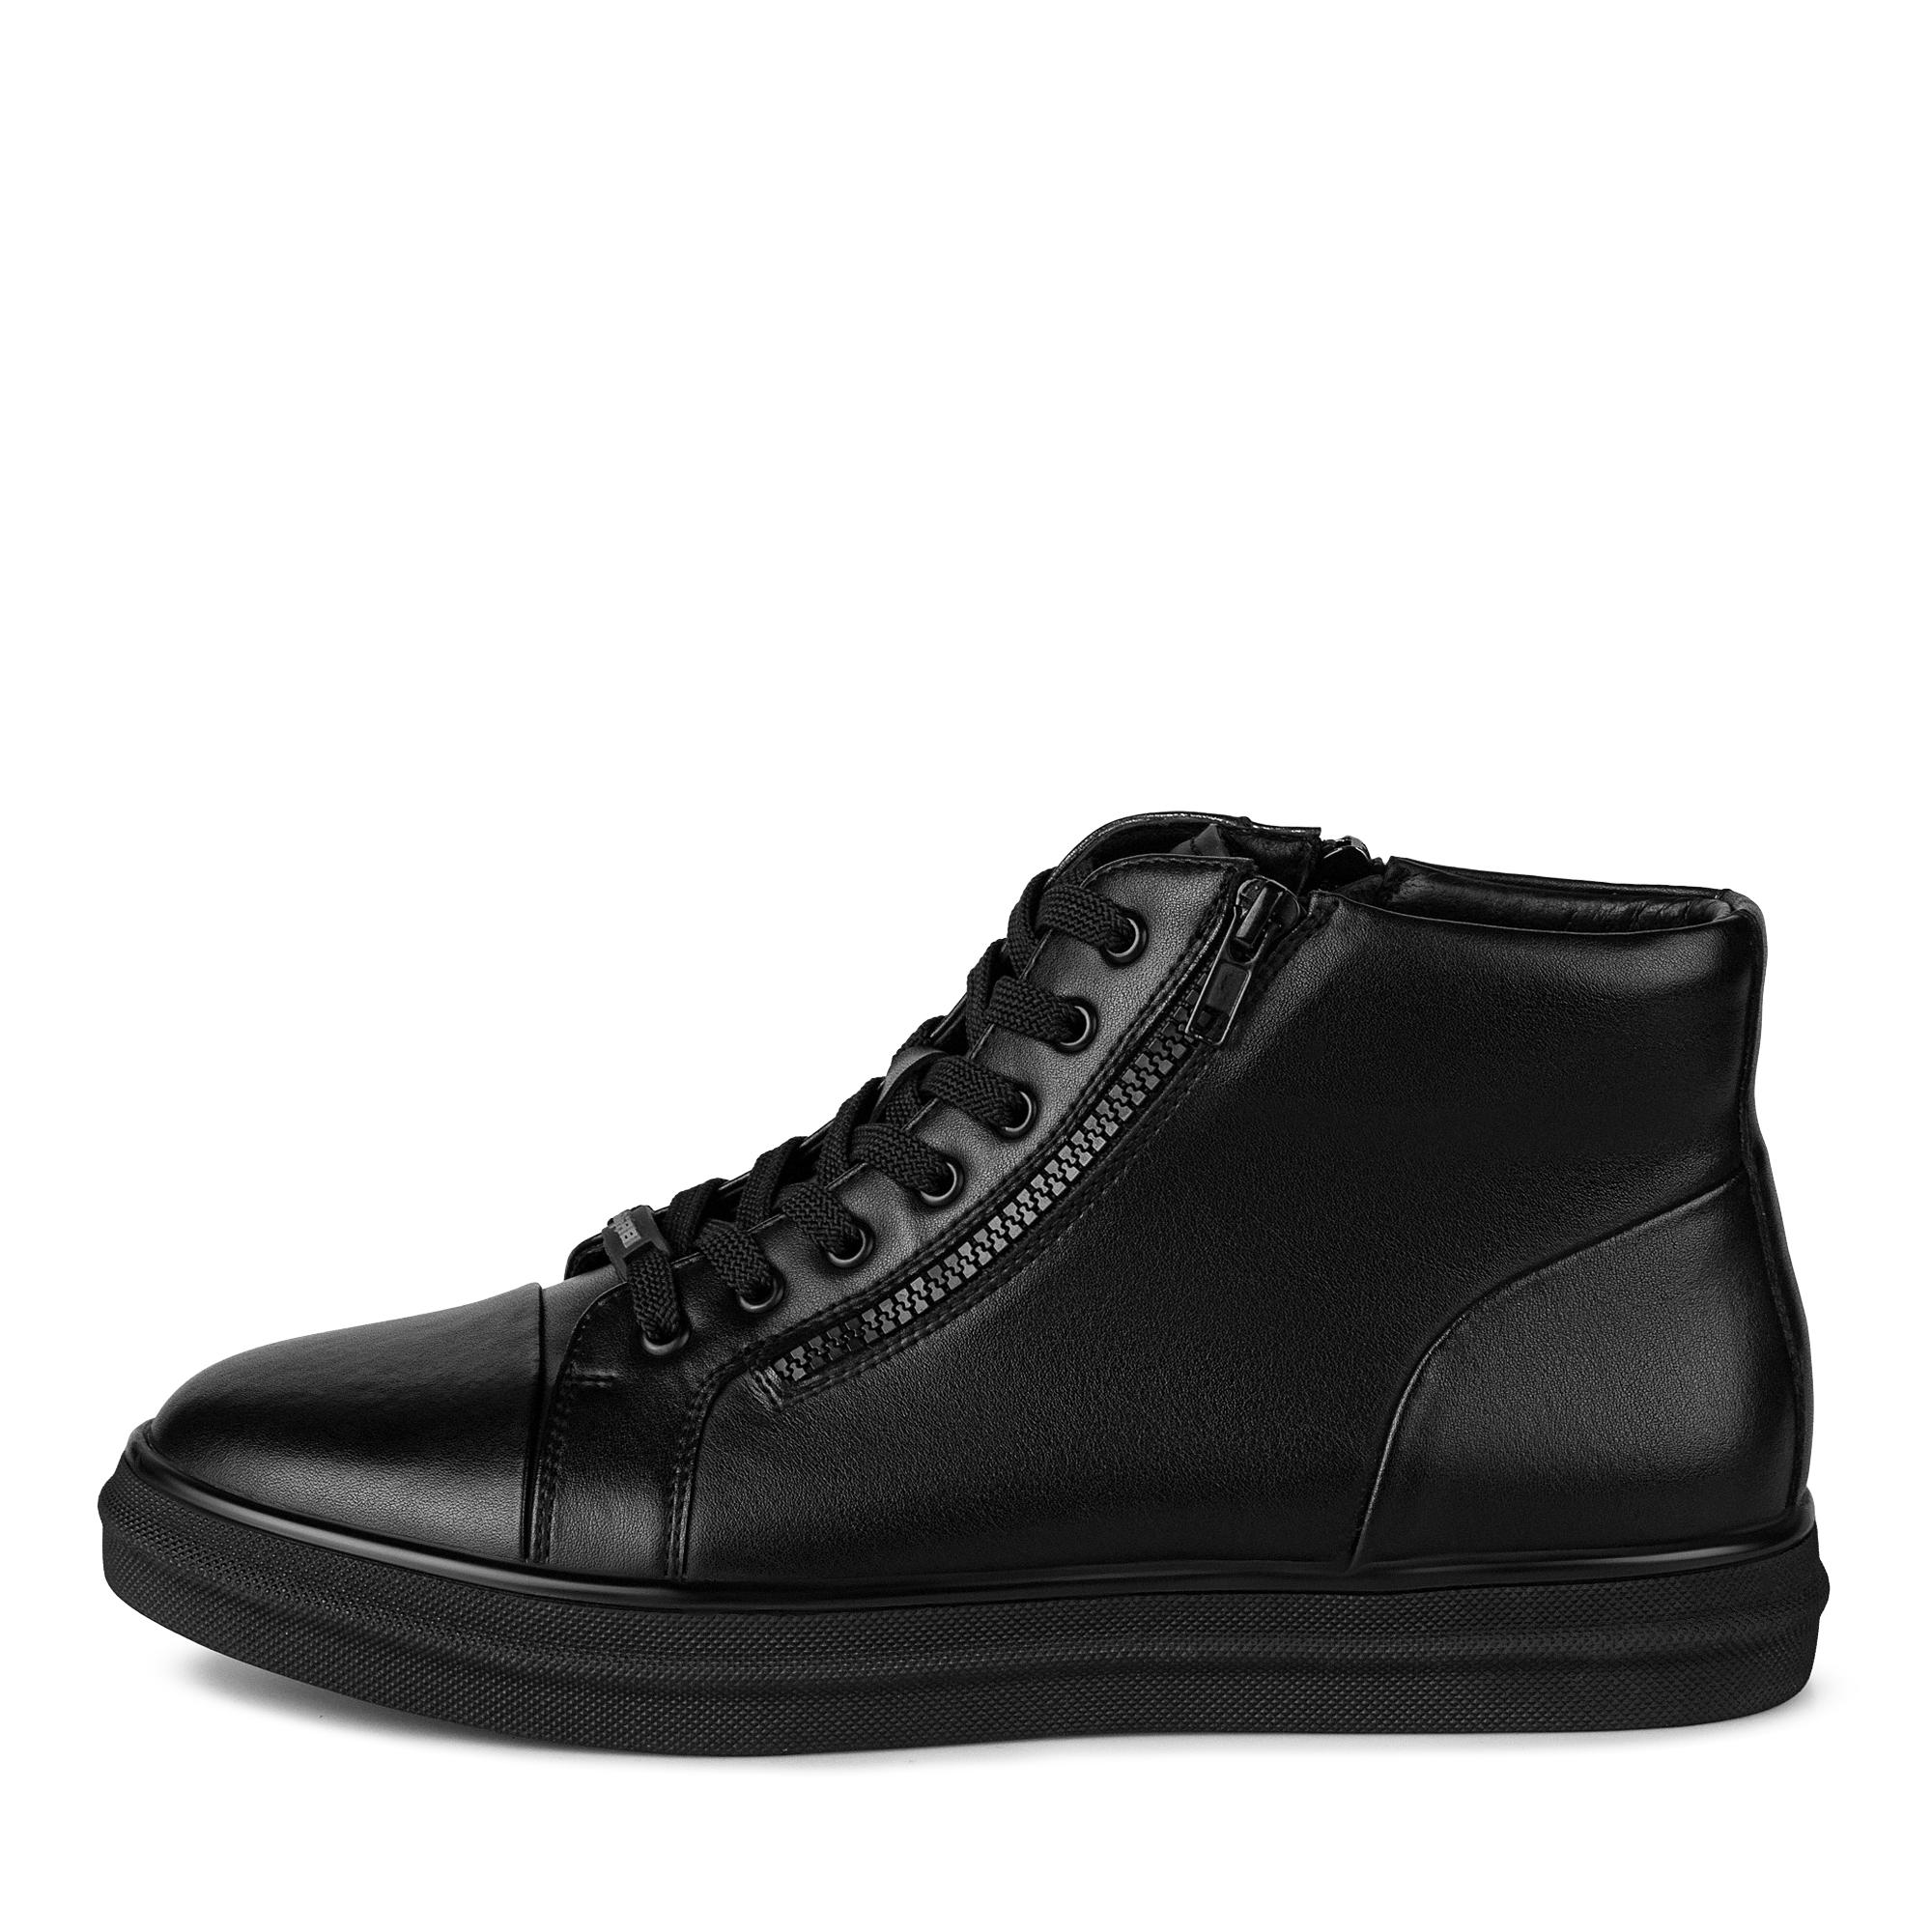 Ботинки BRIGGS 104-367C-2602